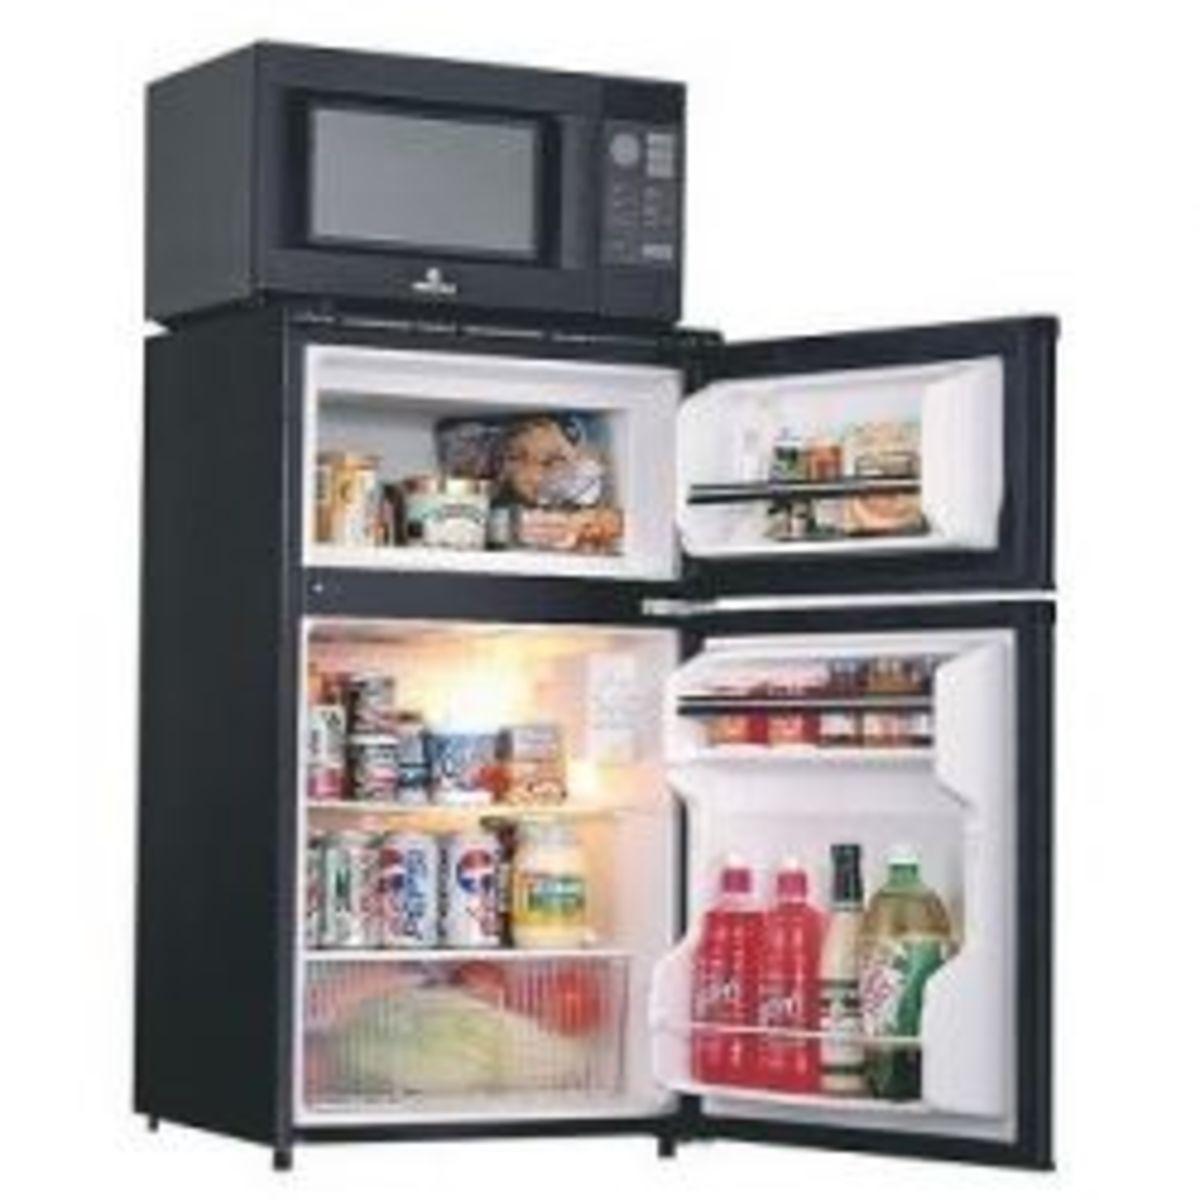 3-in-1 small dorm appliance